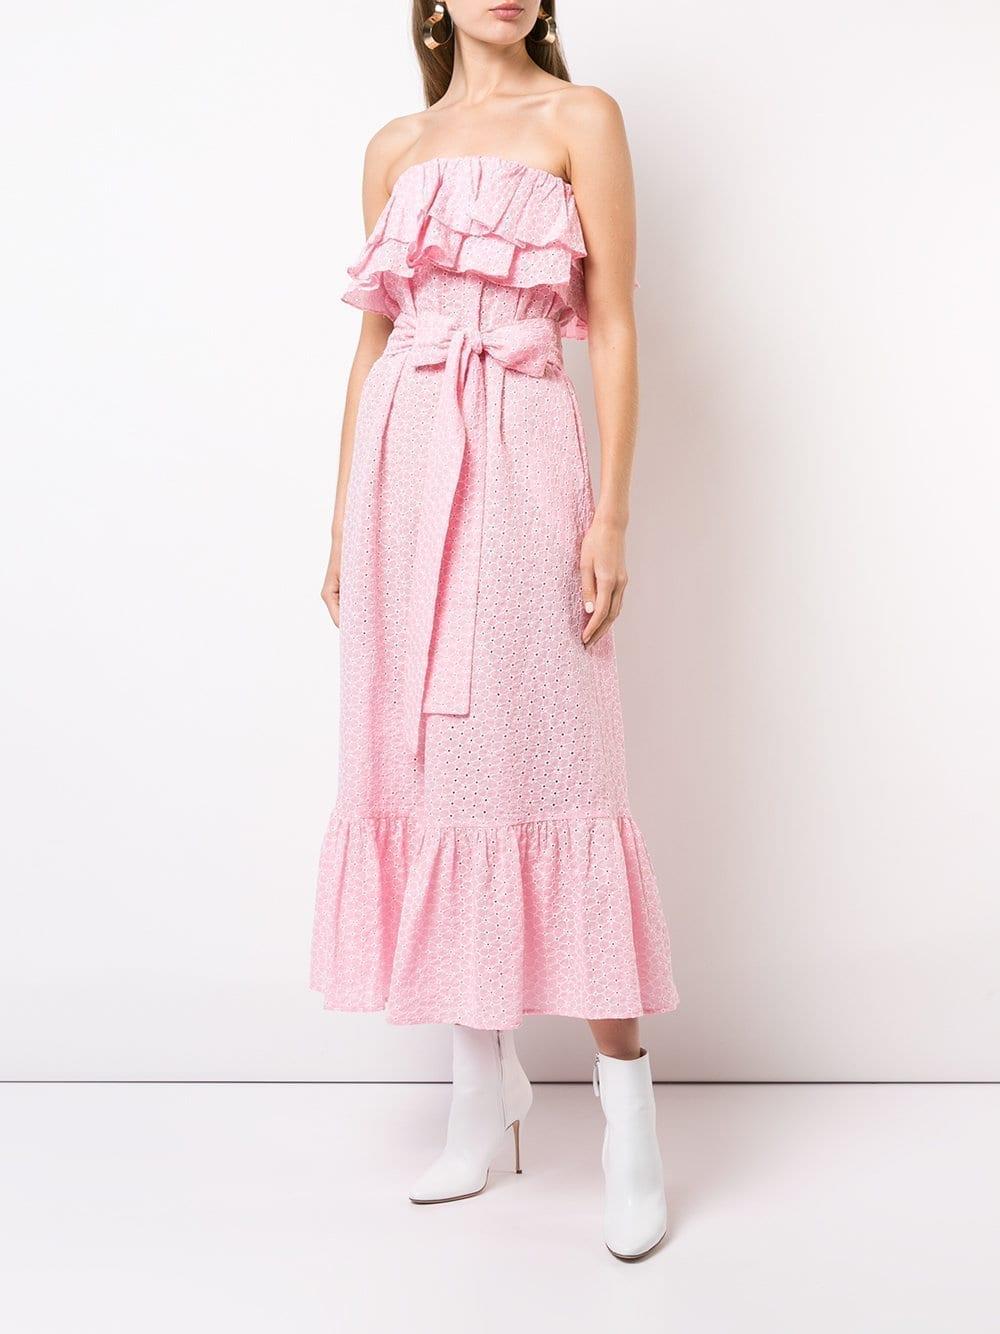 LISA MARIE FERNANDEZ Strapless Ruffle Midi Pink Dress